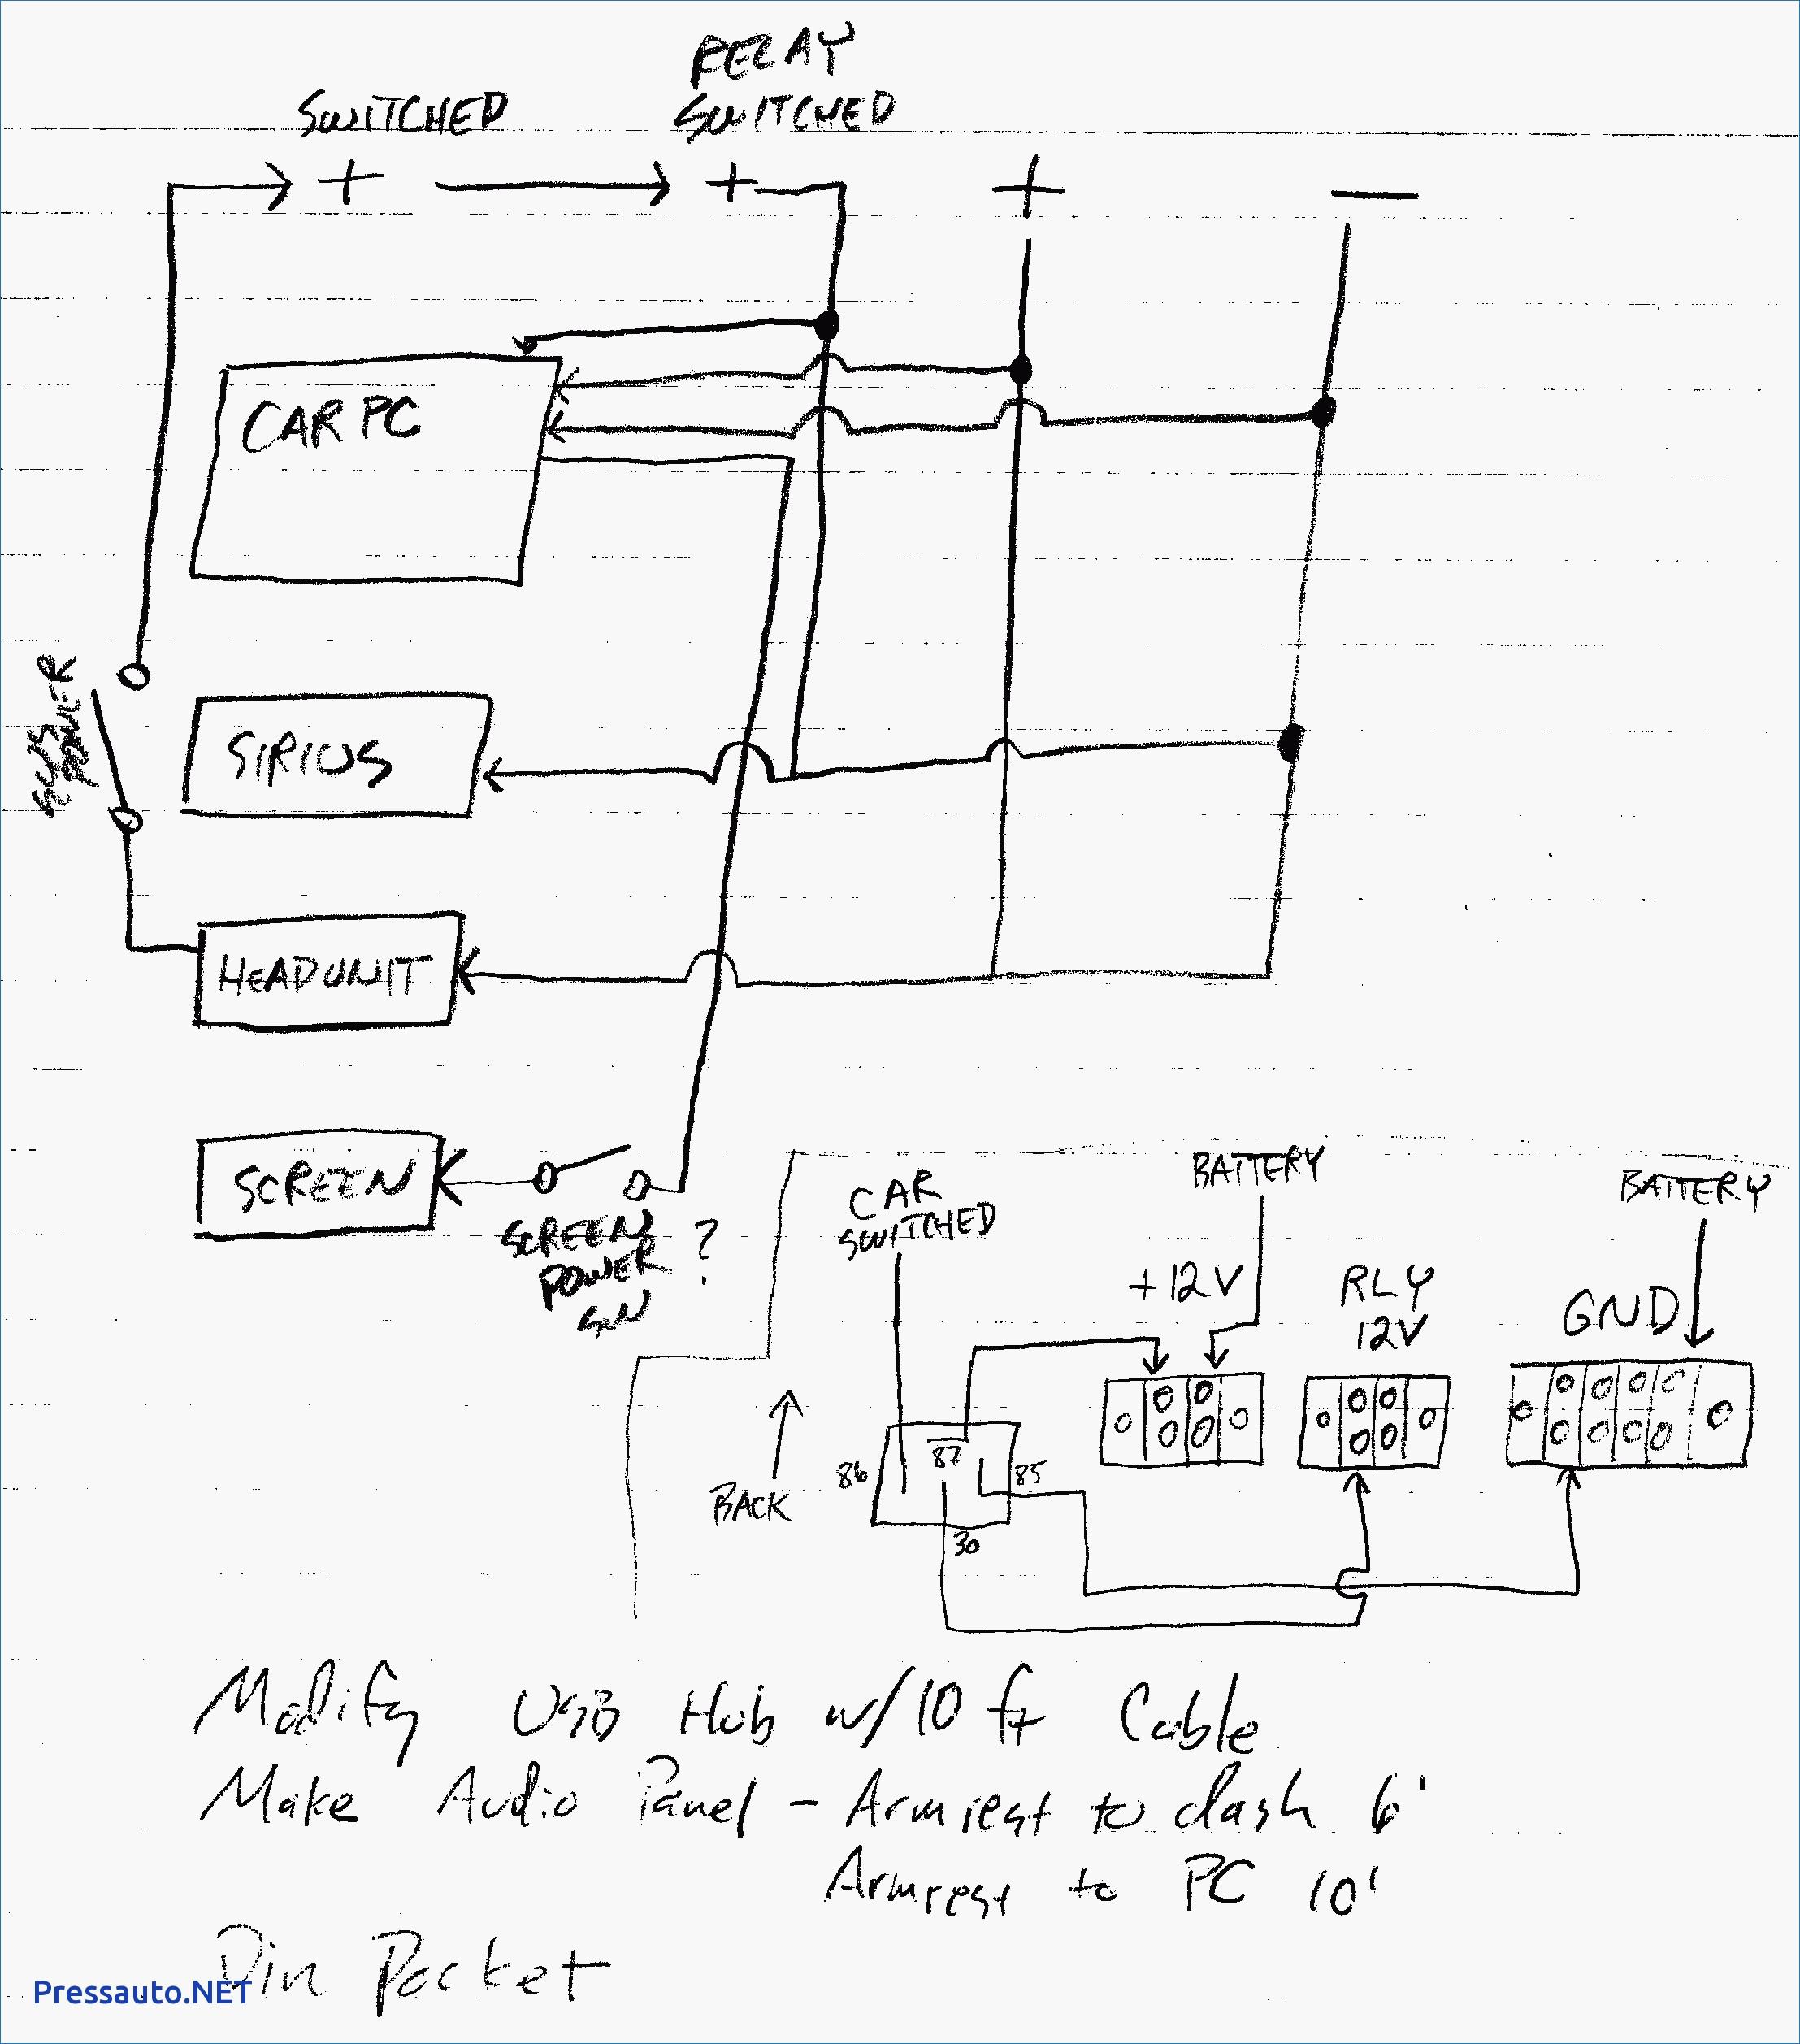 Diamond Snow Plow Wiring Diagrams Electrical Circuit Meyer Snow Plow - Meyer Snow Plow Wiring Diagram